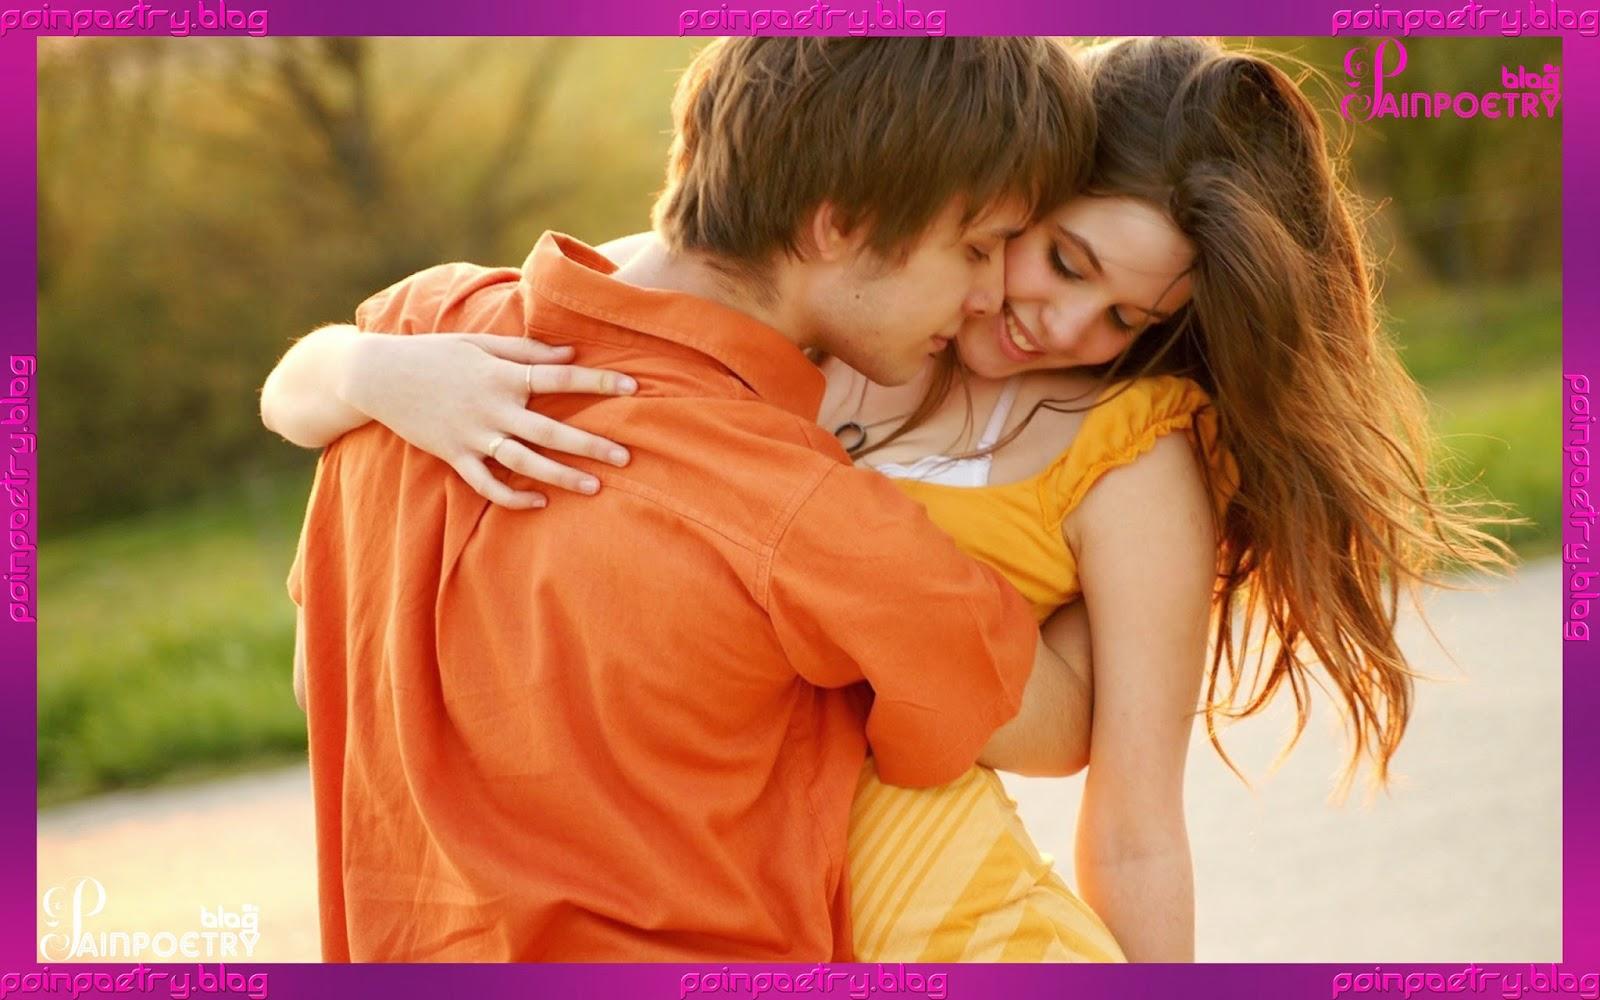 Love-Wallpaper-Boy-With-Her-Girlfriend-Image-HD